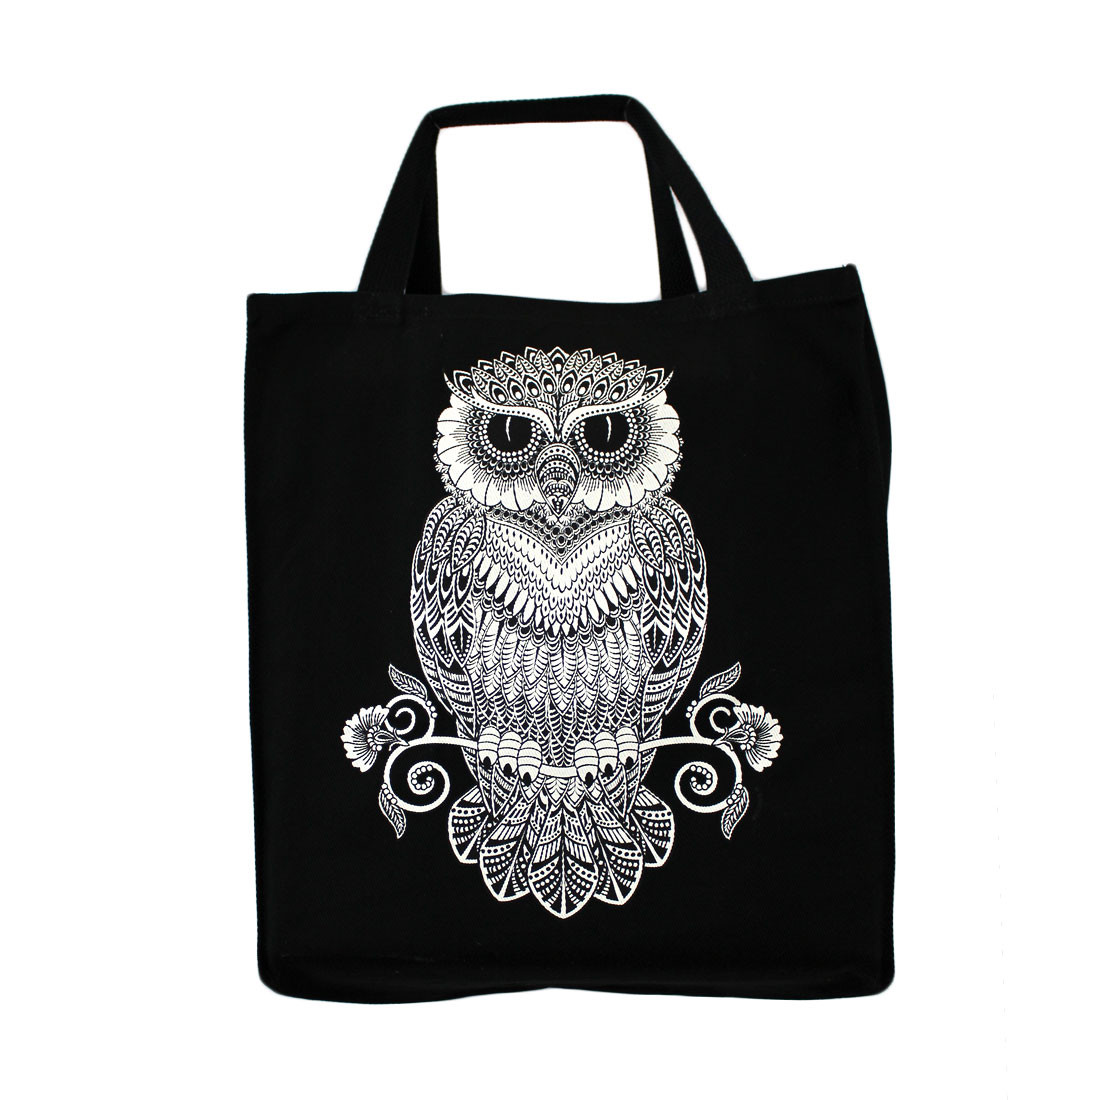 Owl black cotton twill tote bag.